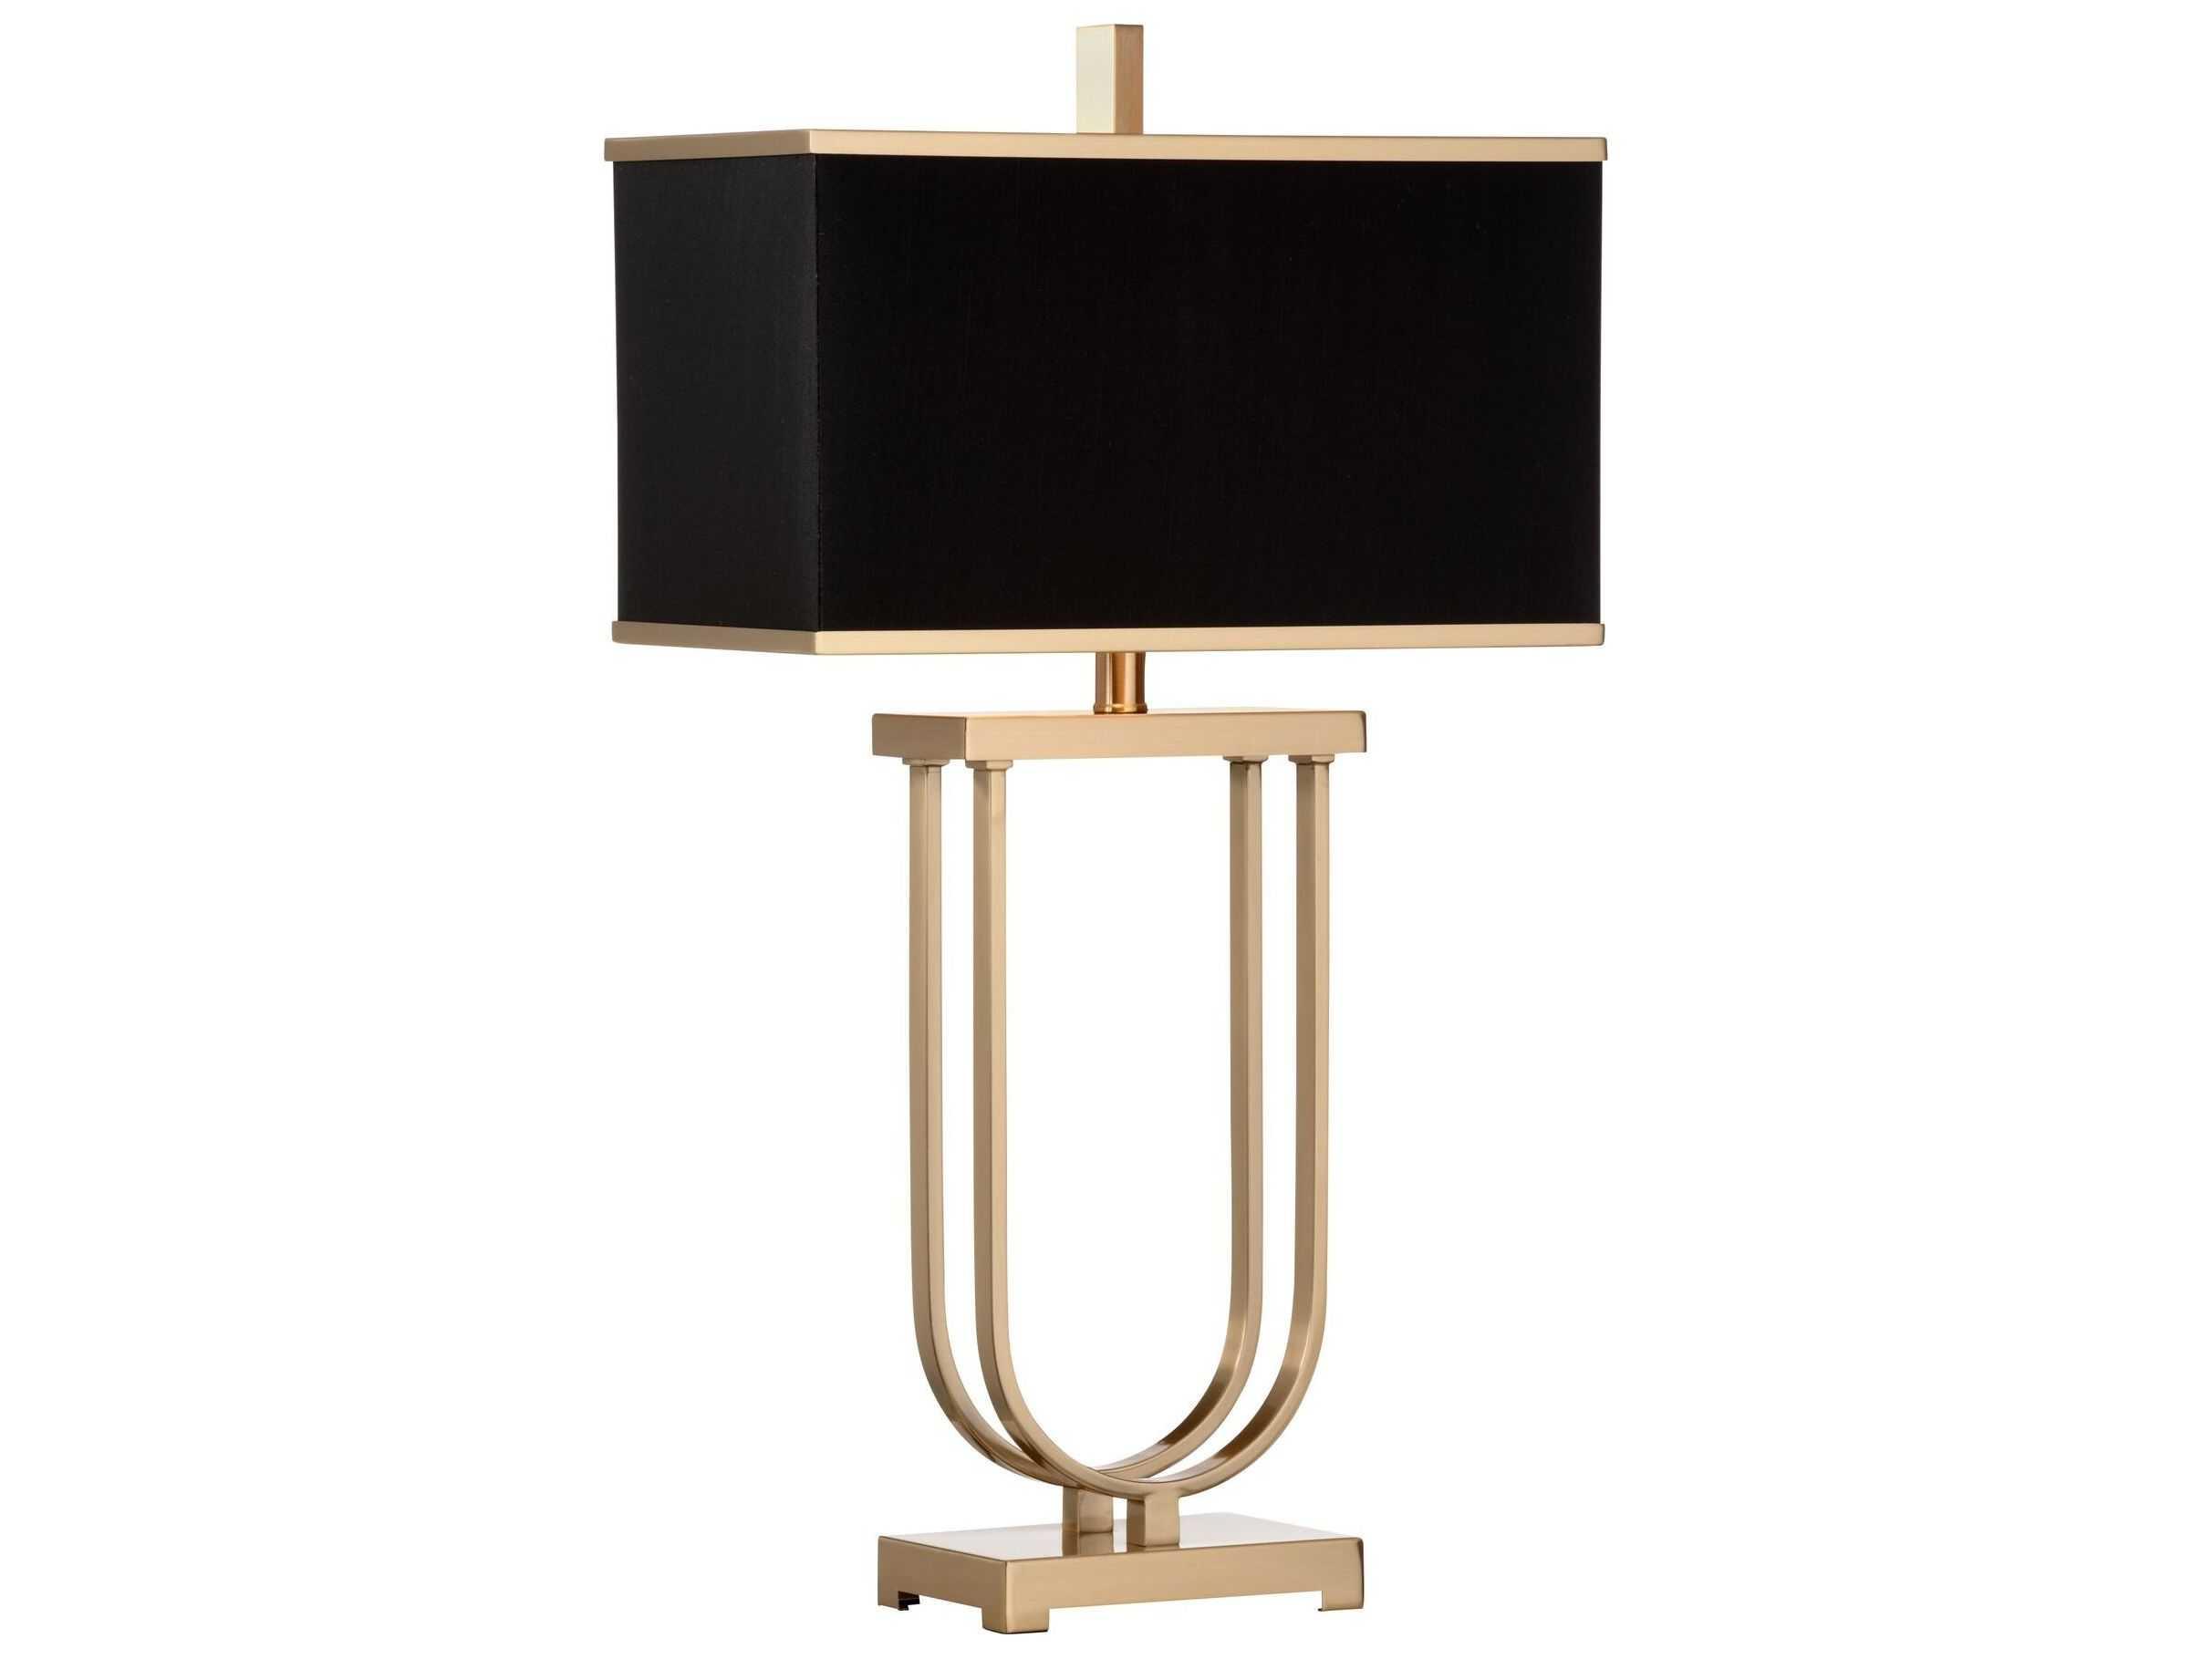 Frederick Cooper Antique Brass Buffet Lamp Fdc65563